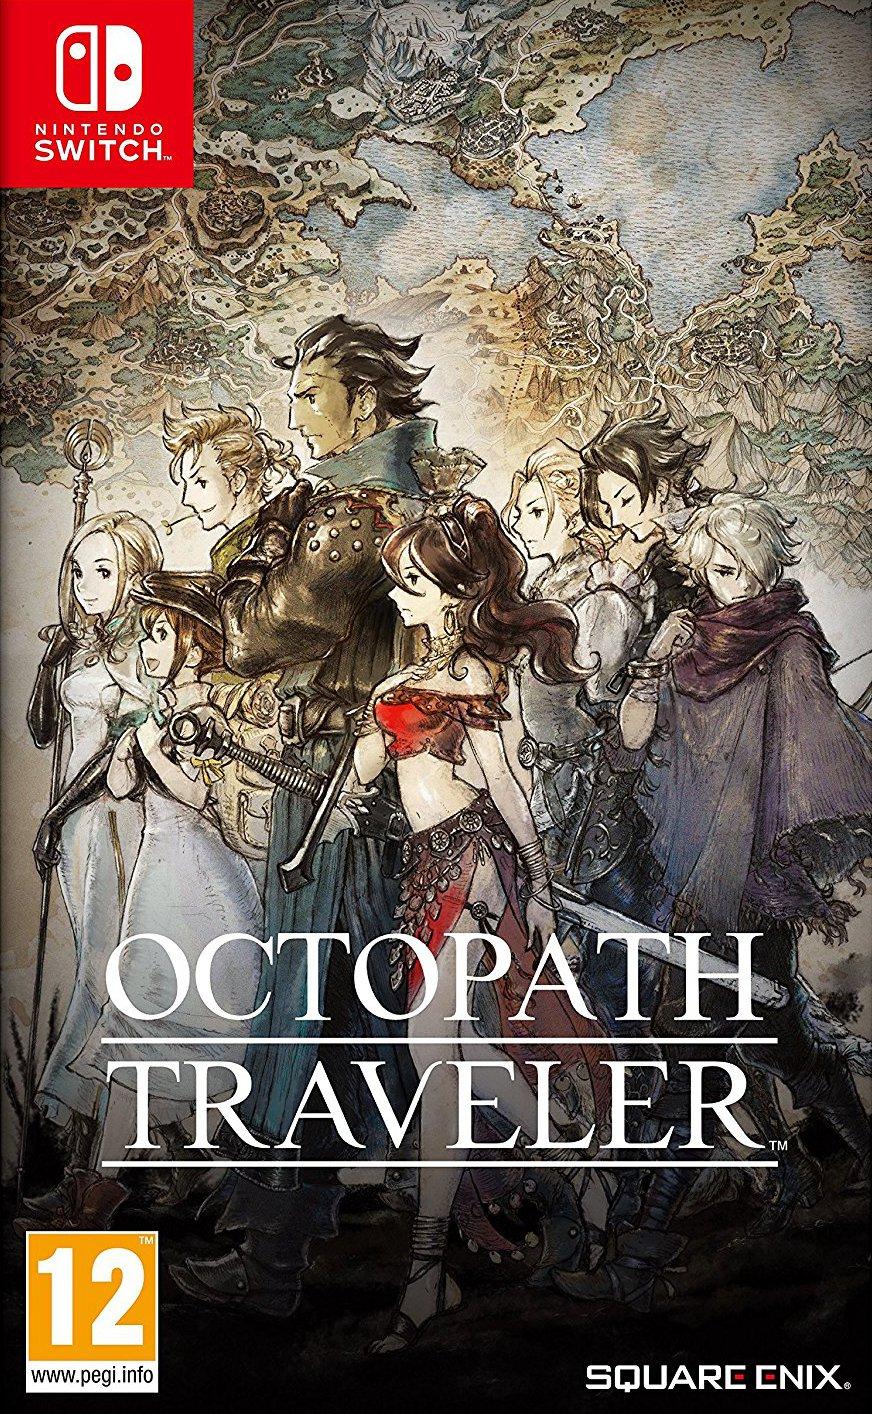 Octopath_Traveler_titre